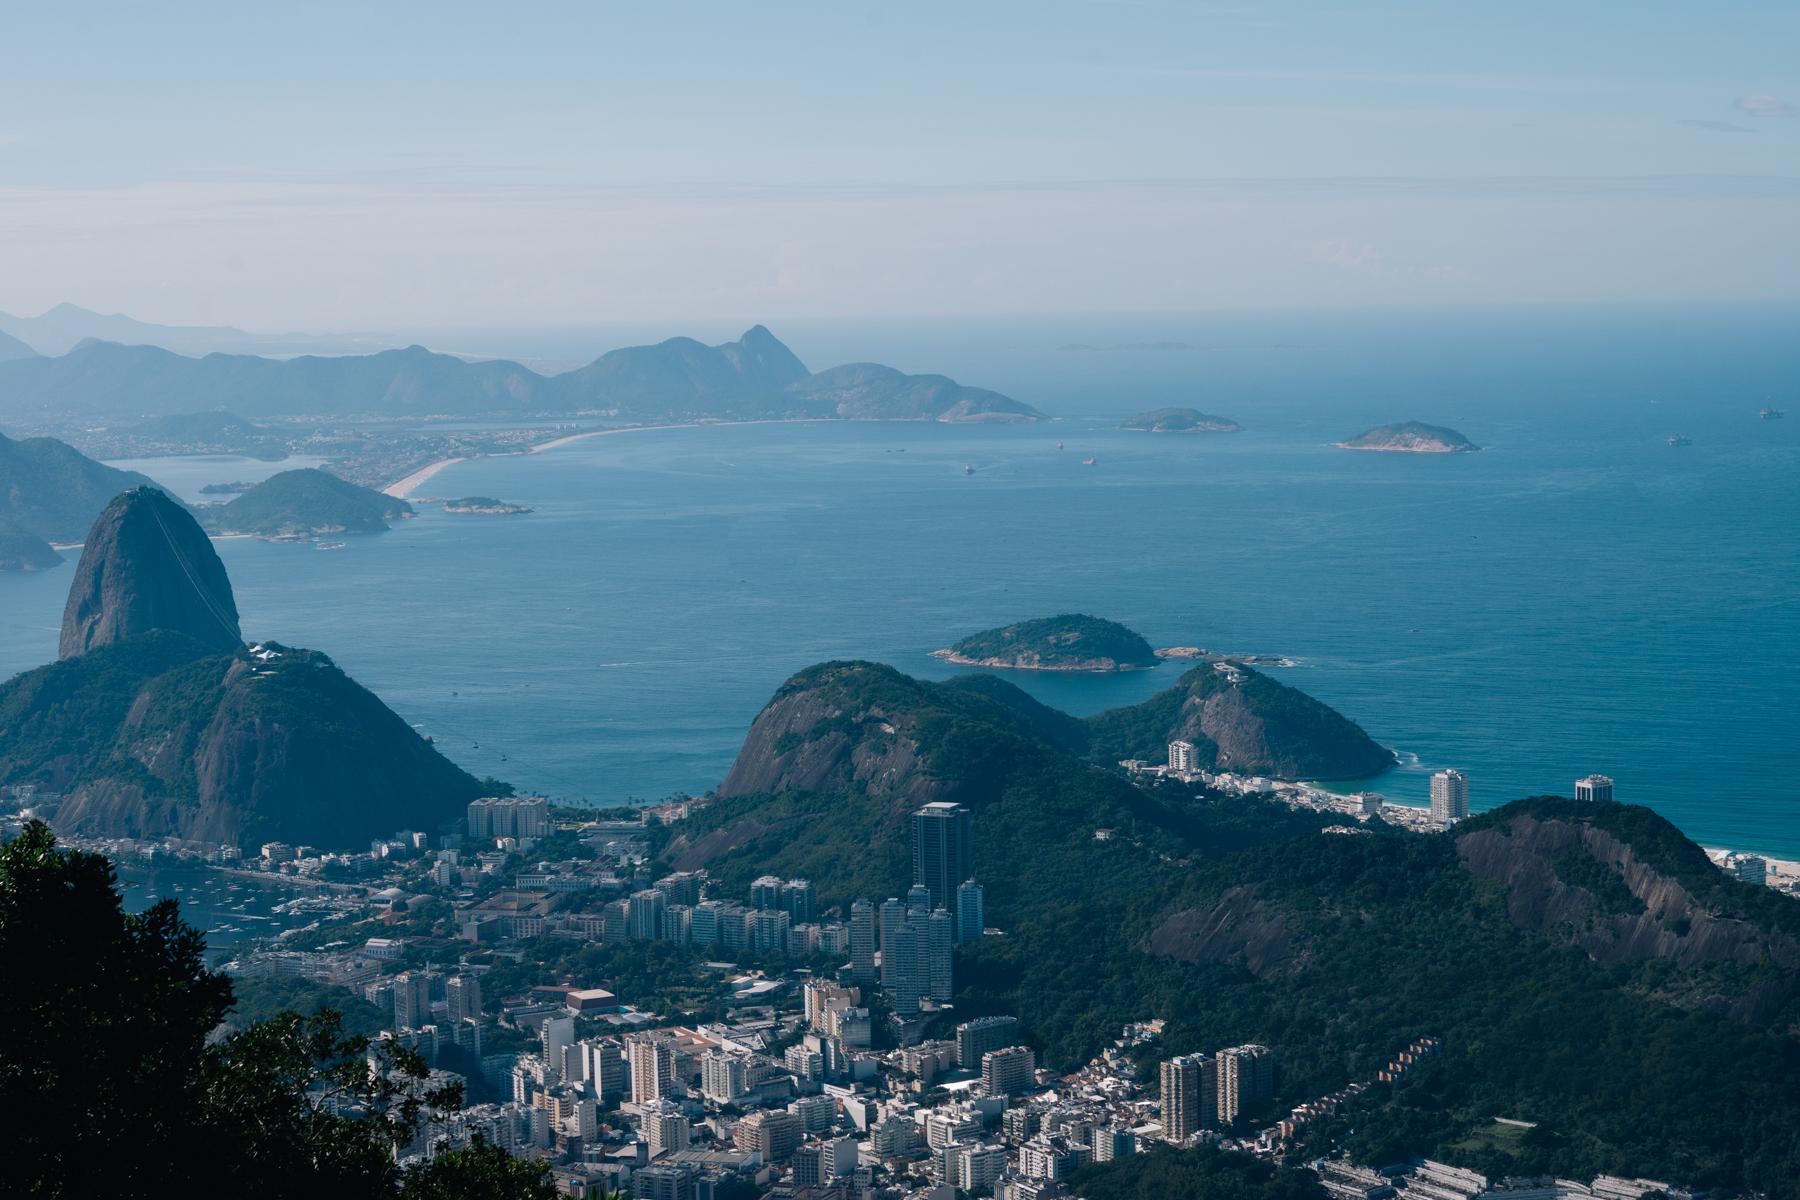 brazil-brasil-world-cup-olympics-rio-de-janeiro-sugar-loaf-corcovad-christ-redeemer-christo-redentor-5